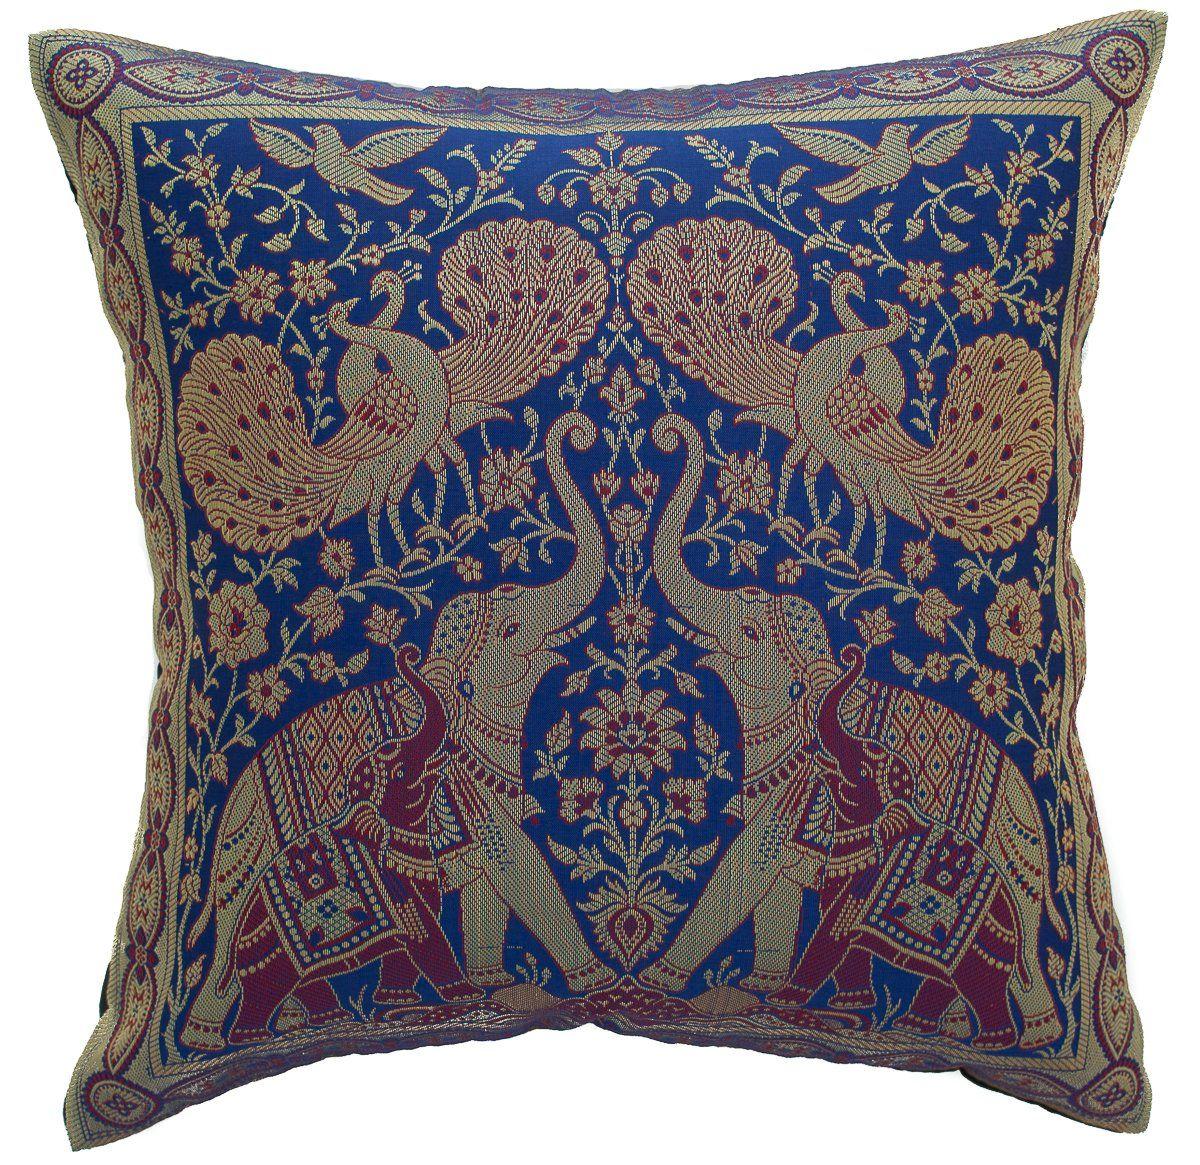 Avarada India Style Elephant Peacock Throw Pillow Cover